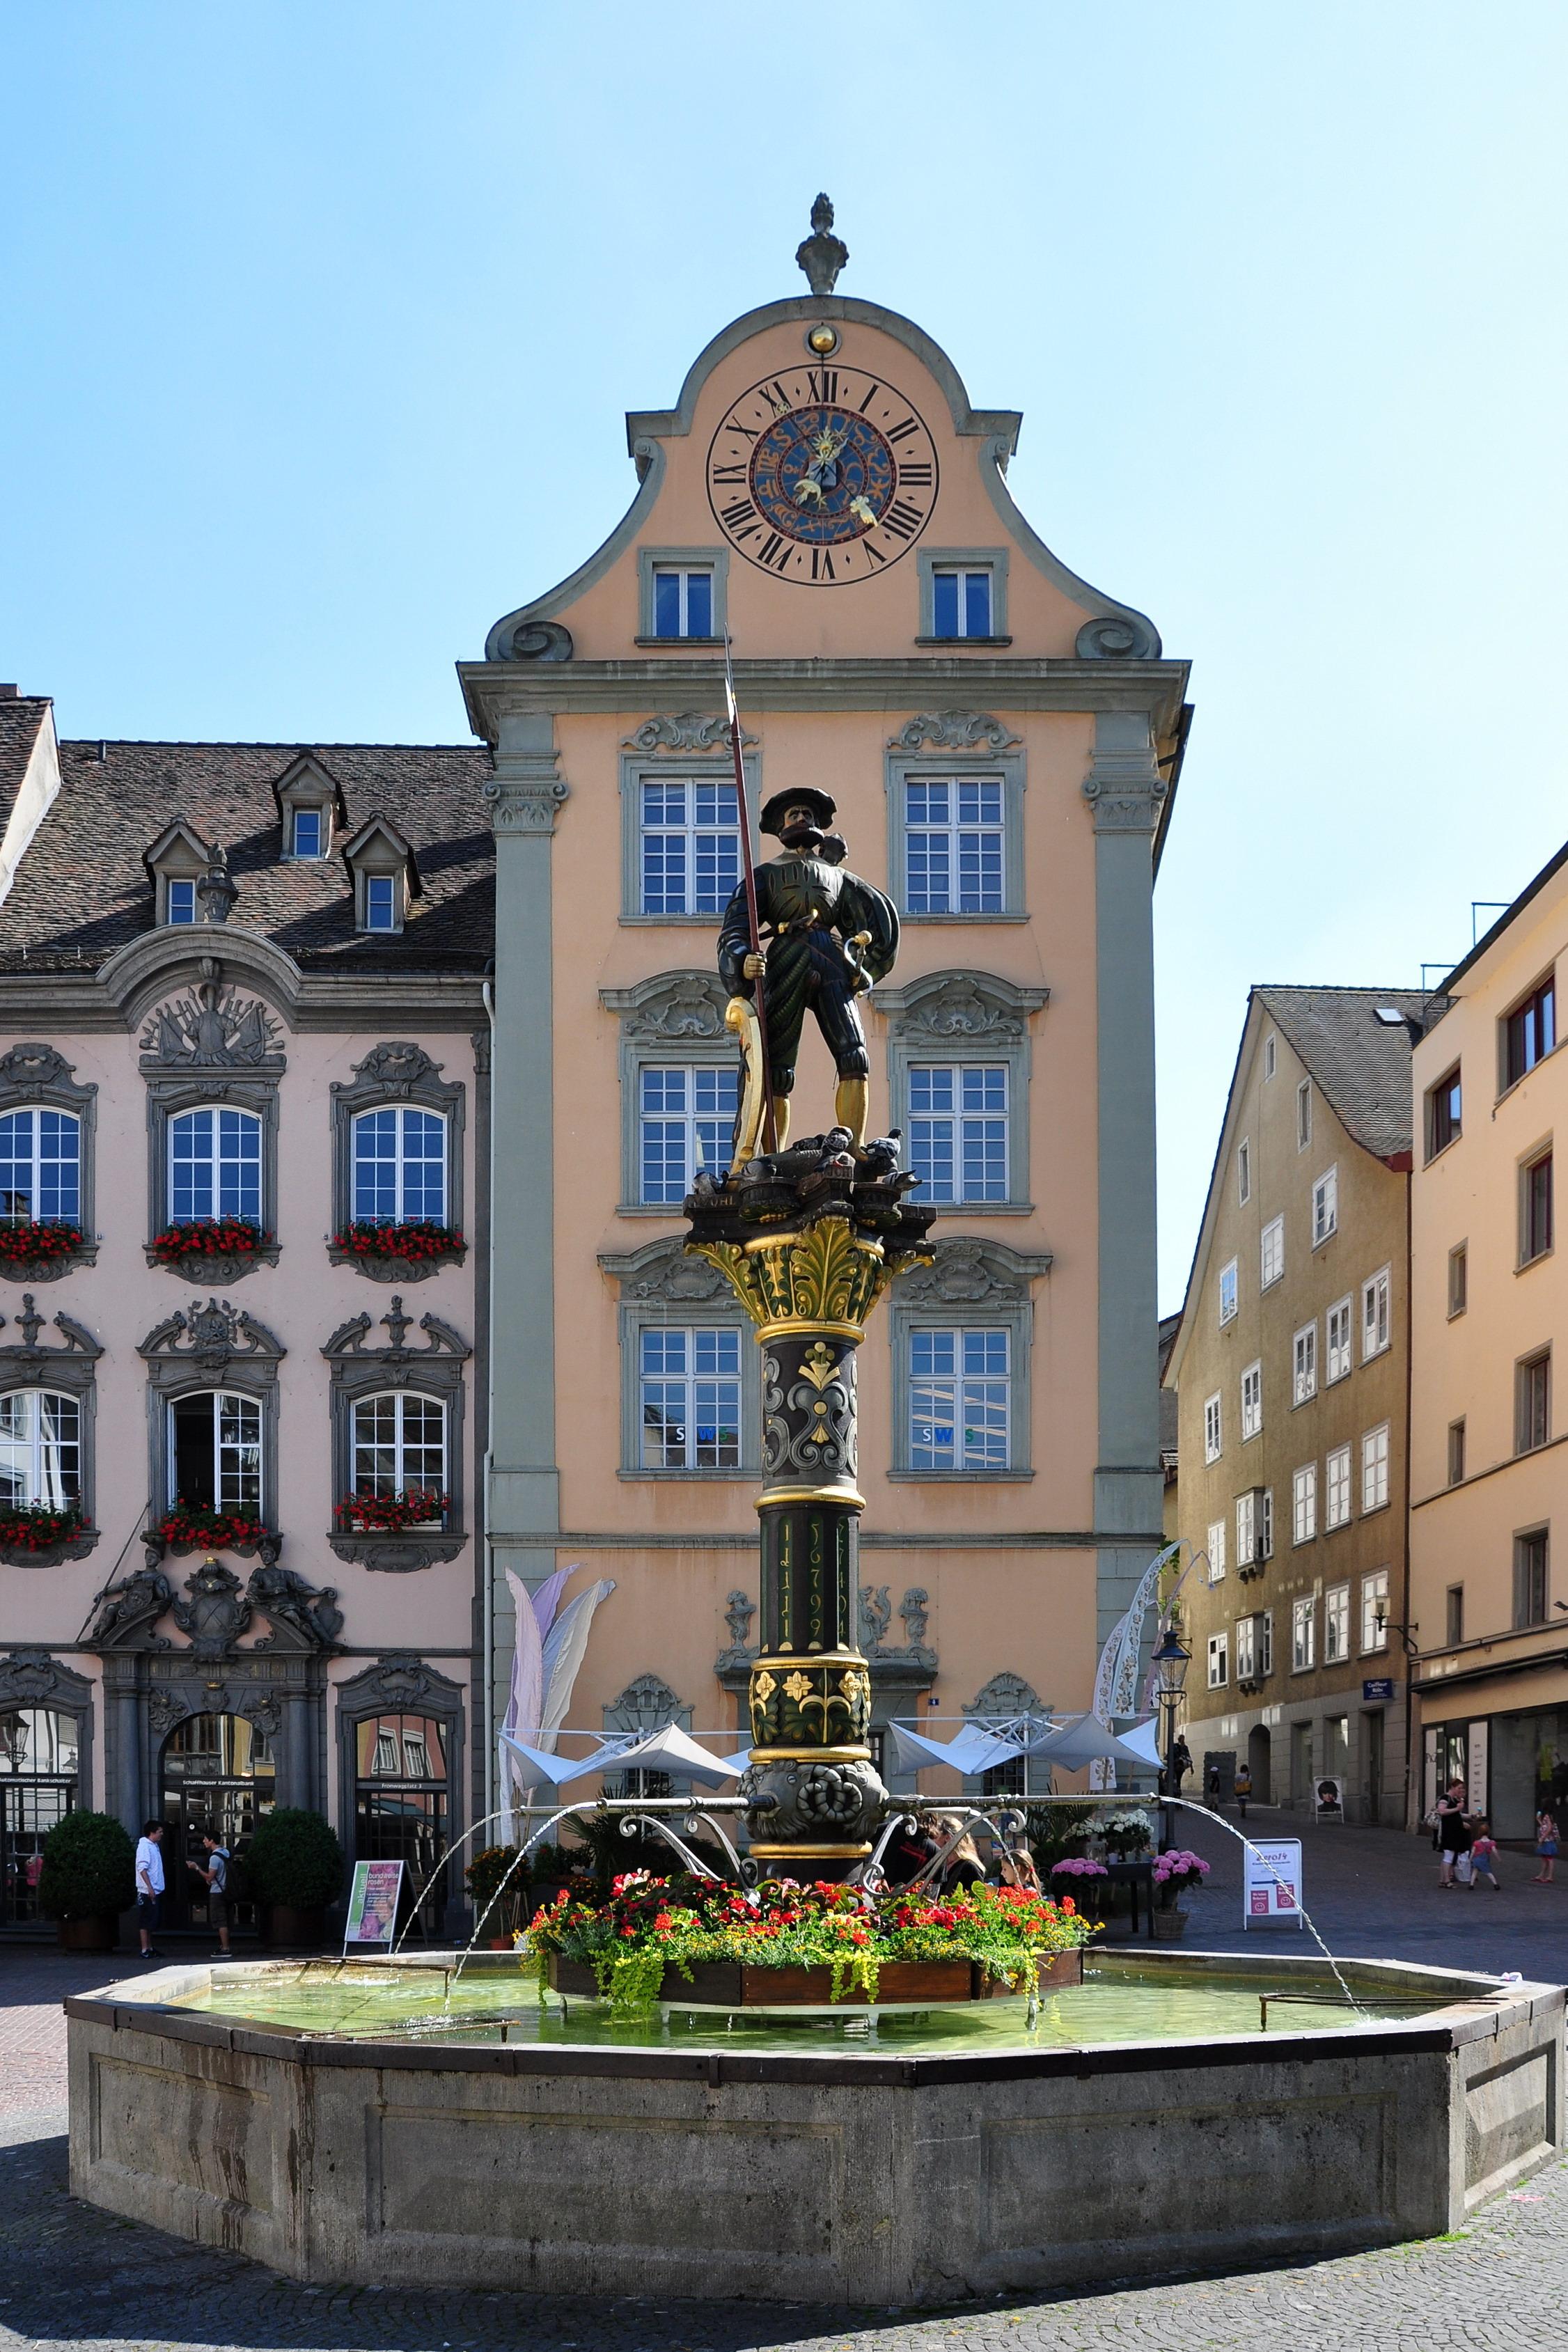 File:Schaffhausen - Fronwagplatz - Landsknechtbrunnen 2010-06-24 16-37-12  ShiftN.jpg - Wikimedia Commons